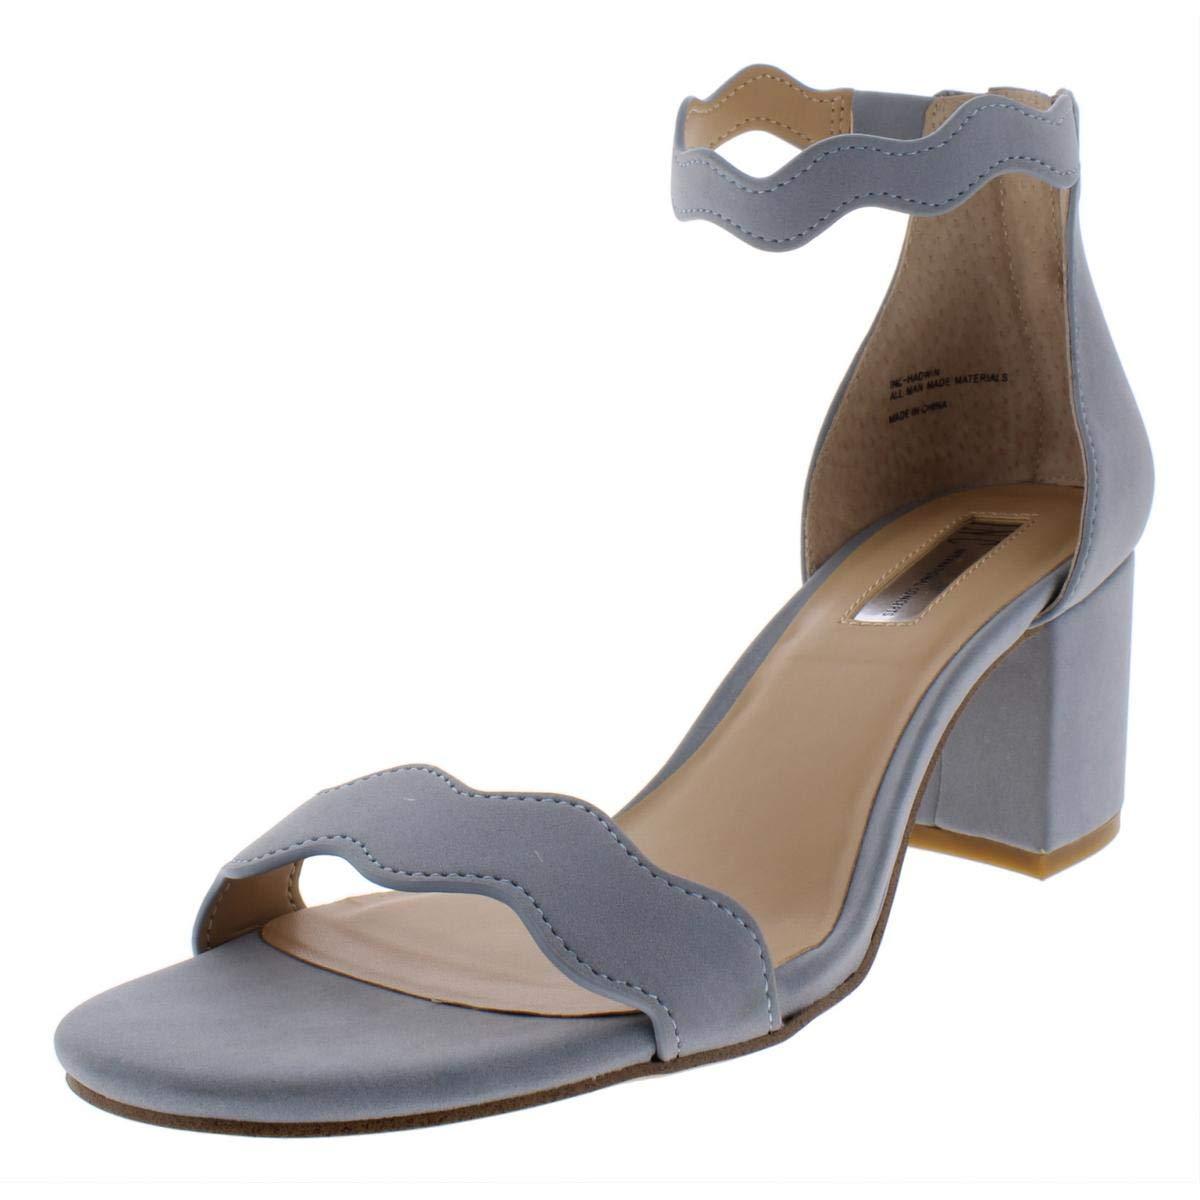 - Inc Womens Hadwin Faux Leather Scalloped Heels bluee 5 Medium (B,M)